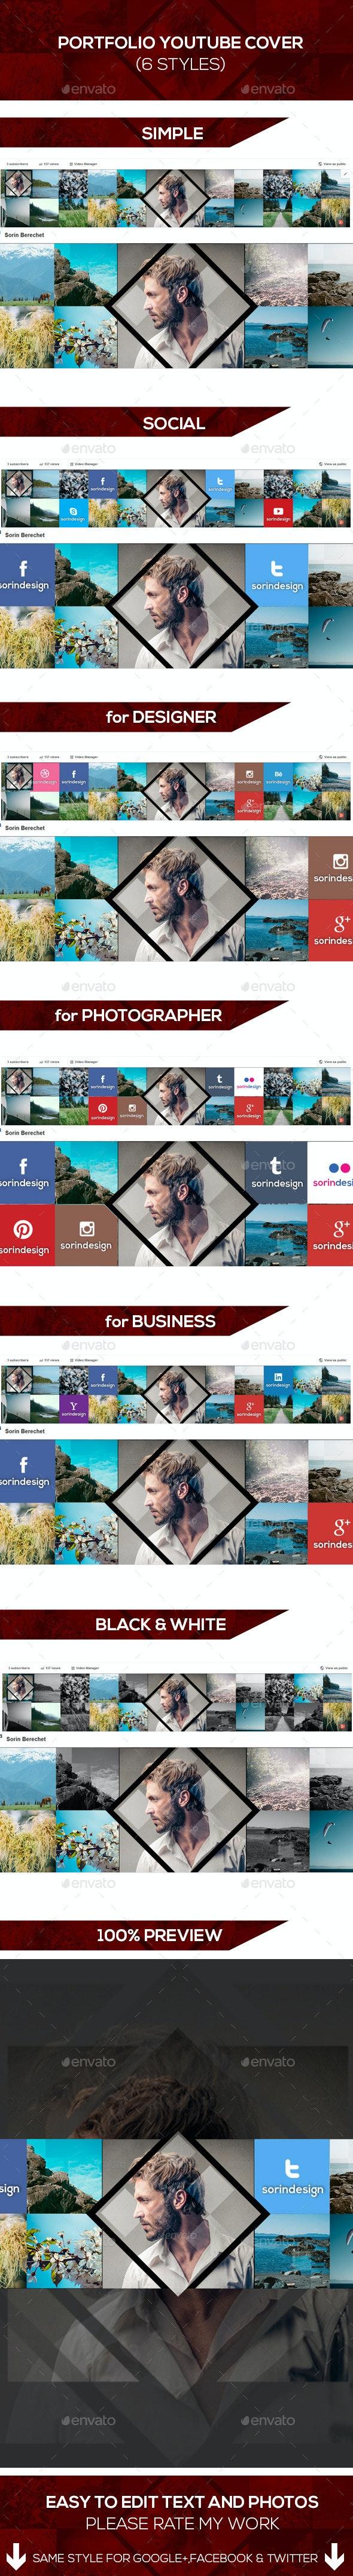 Portfolio Youtube Covers Pack - YouTube Social Media